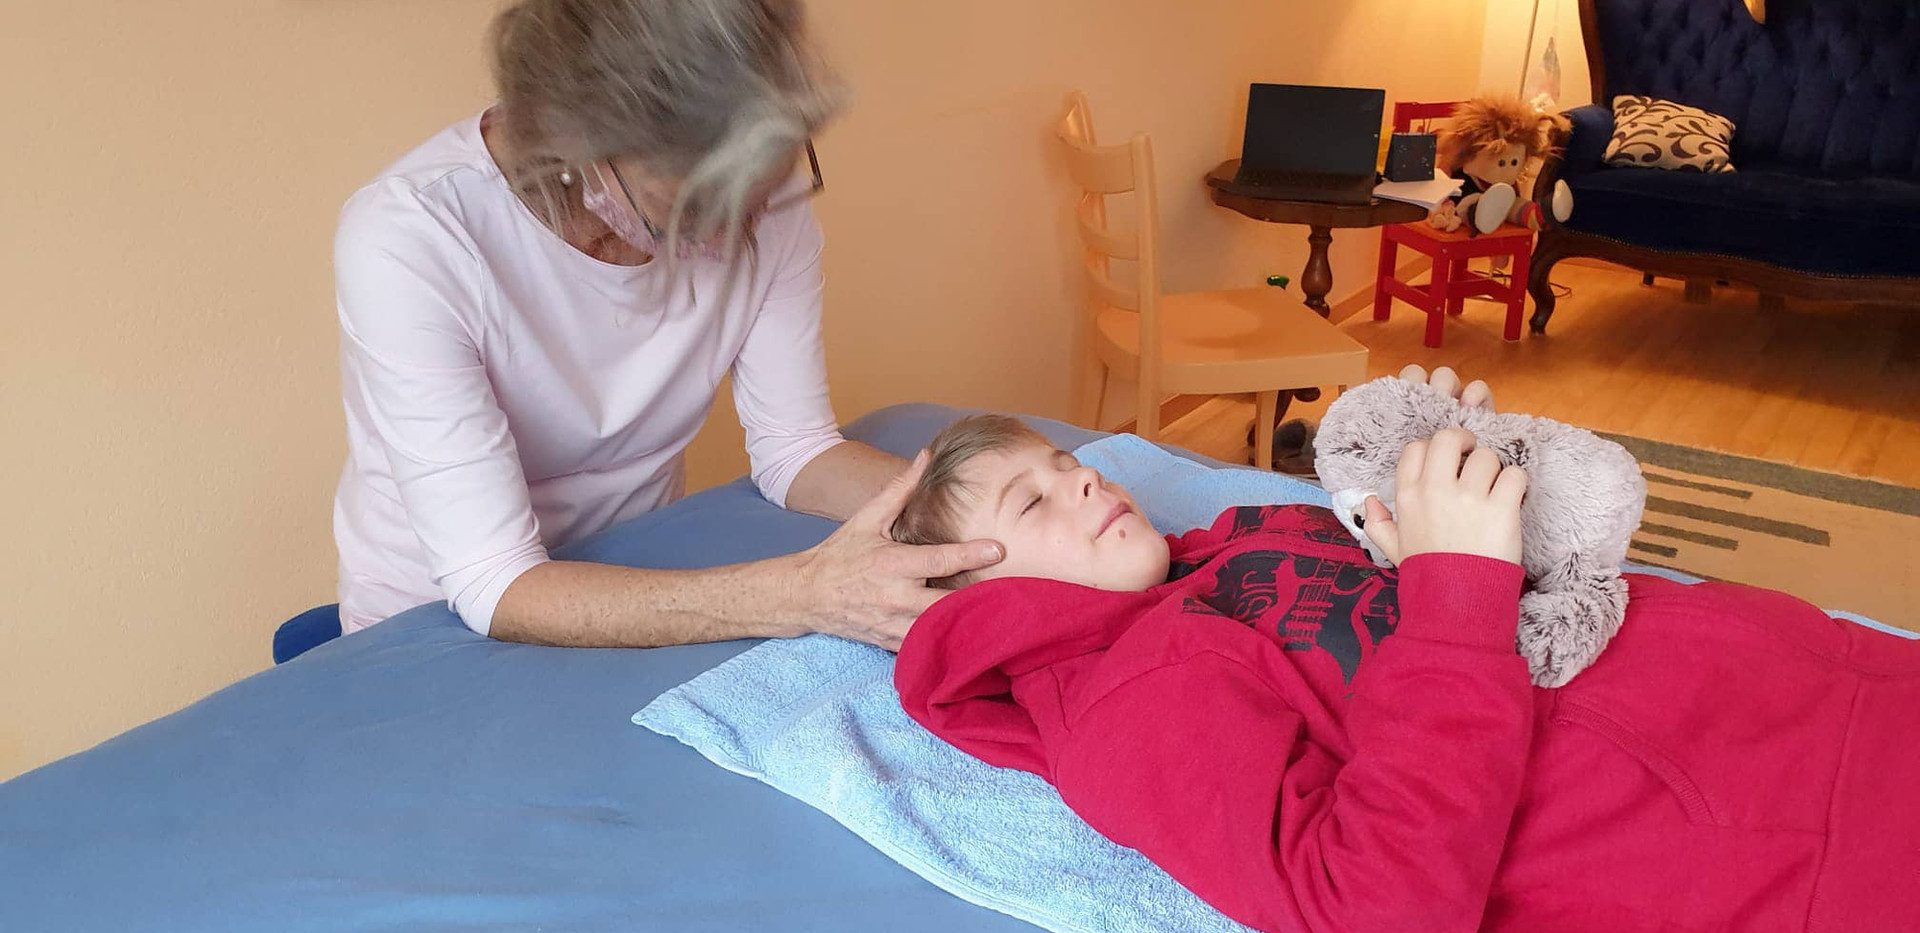 craniosactral-therapie-thun-kind-13.jpg